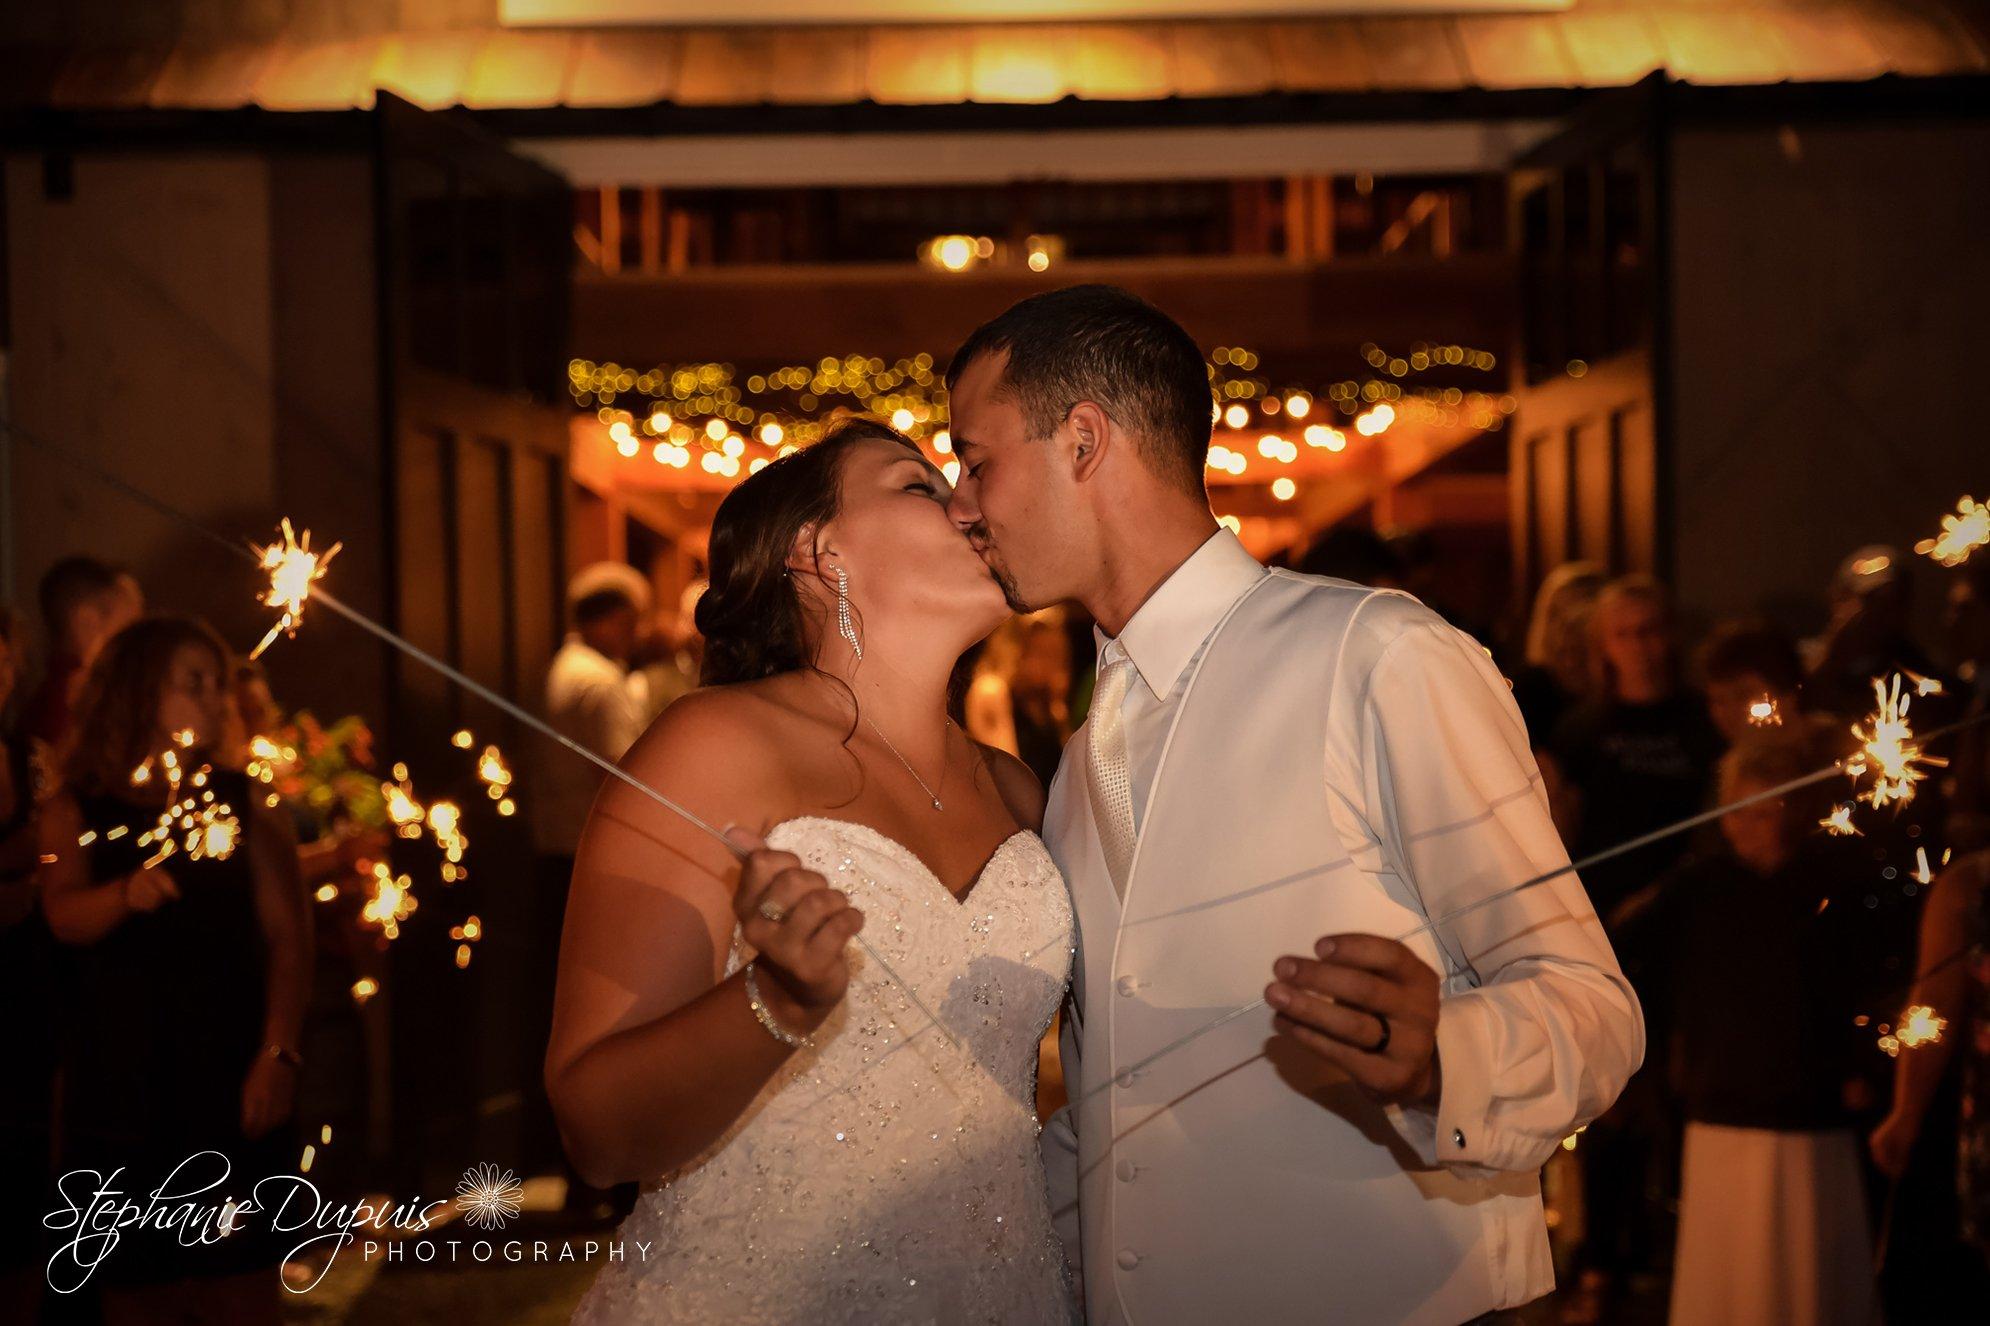 Whitefield Wedding Photographer 08 1 - Portfolio: Nason Wedding